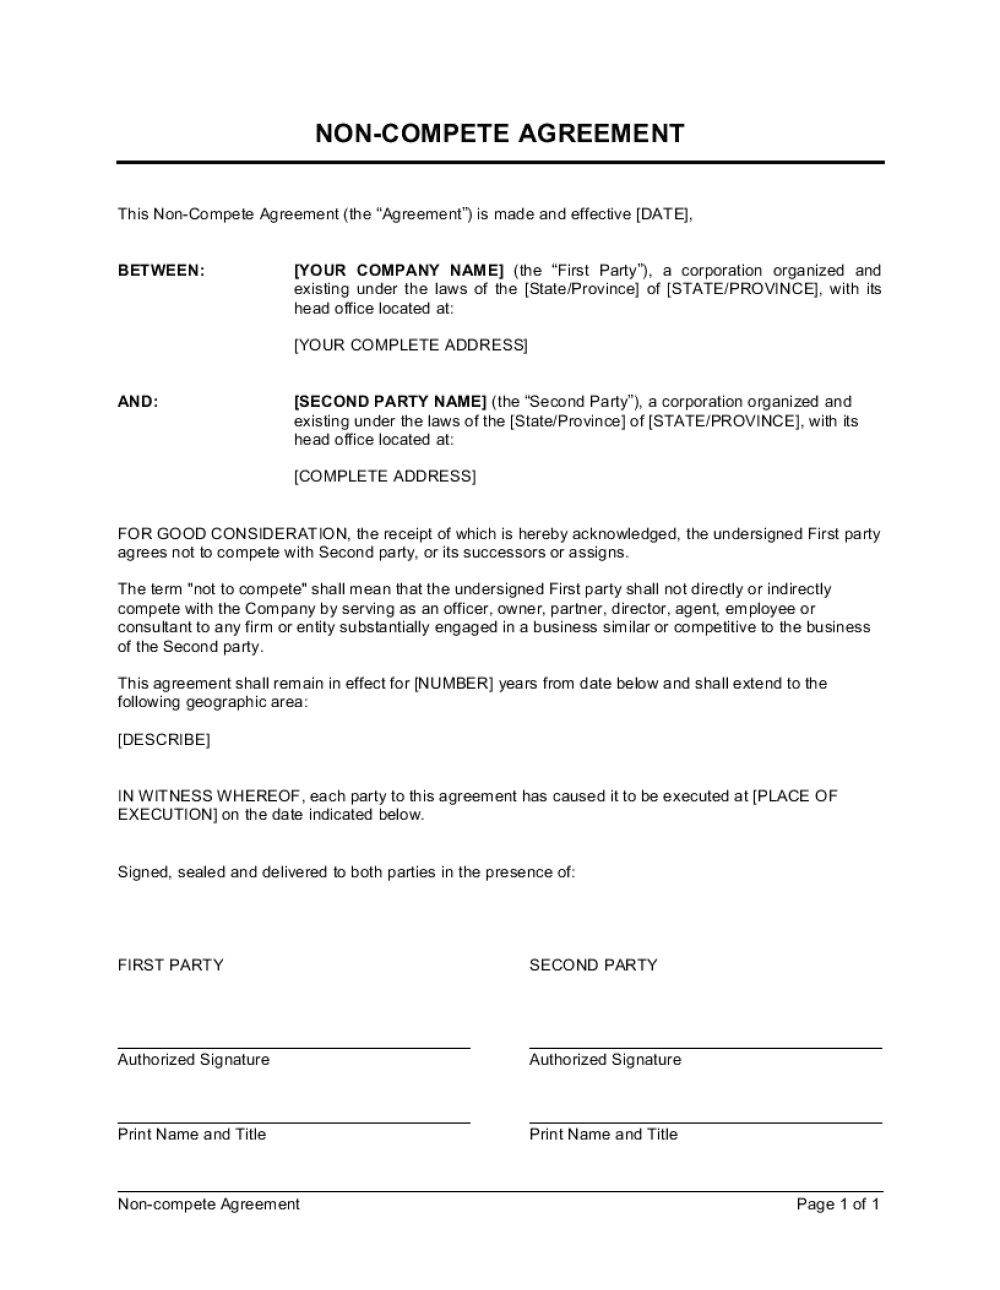 001 Wonderful Non Compete Agreement Template Idea  Sample India Free FloridaFull